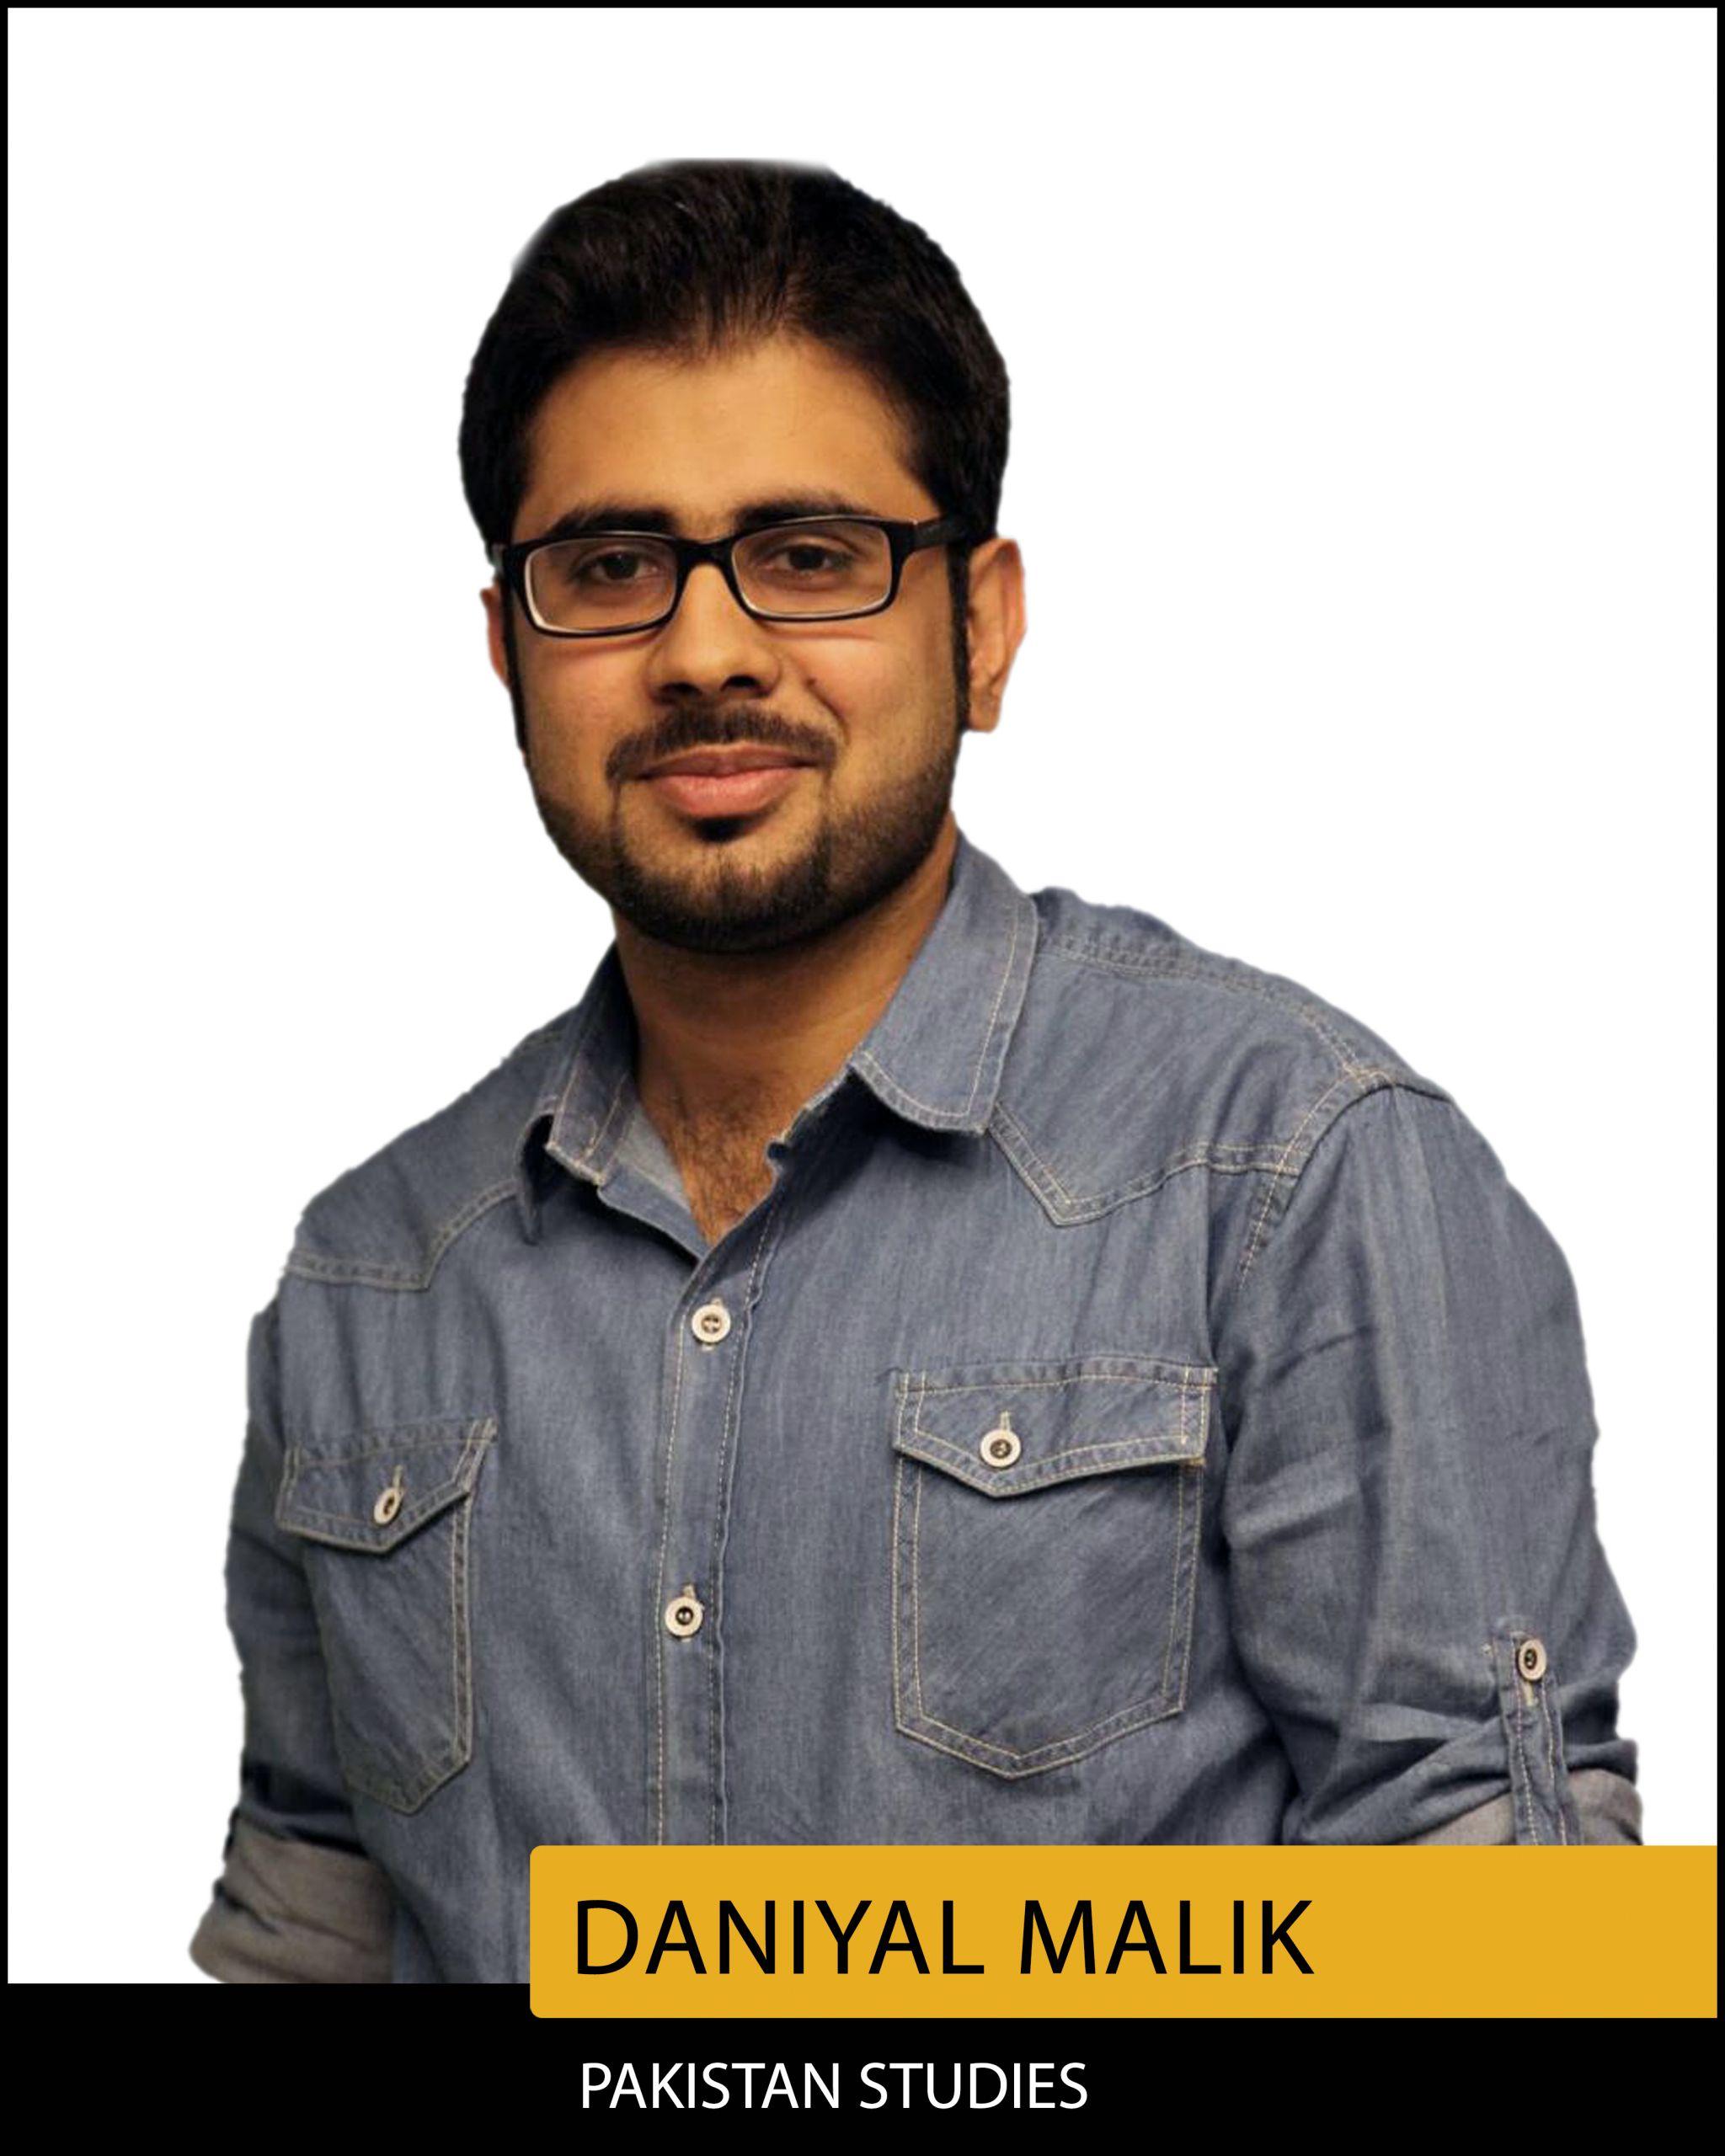 Daniyal Malik